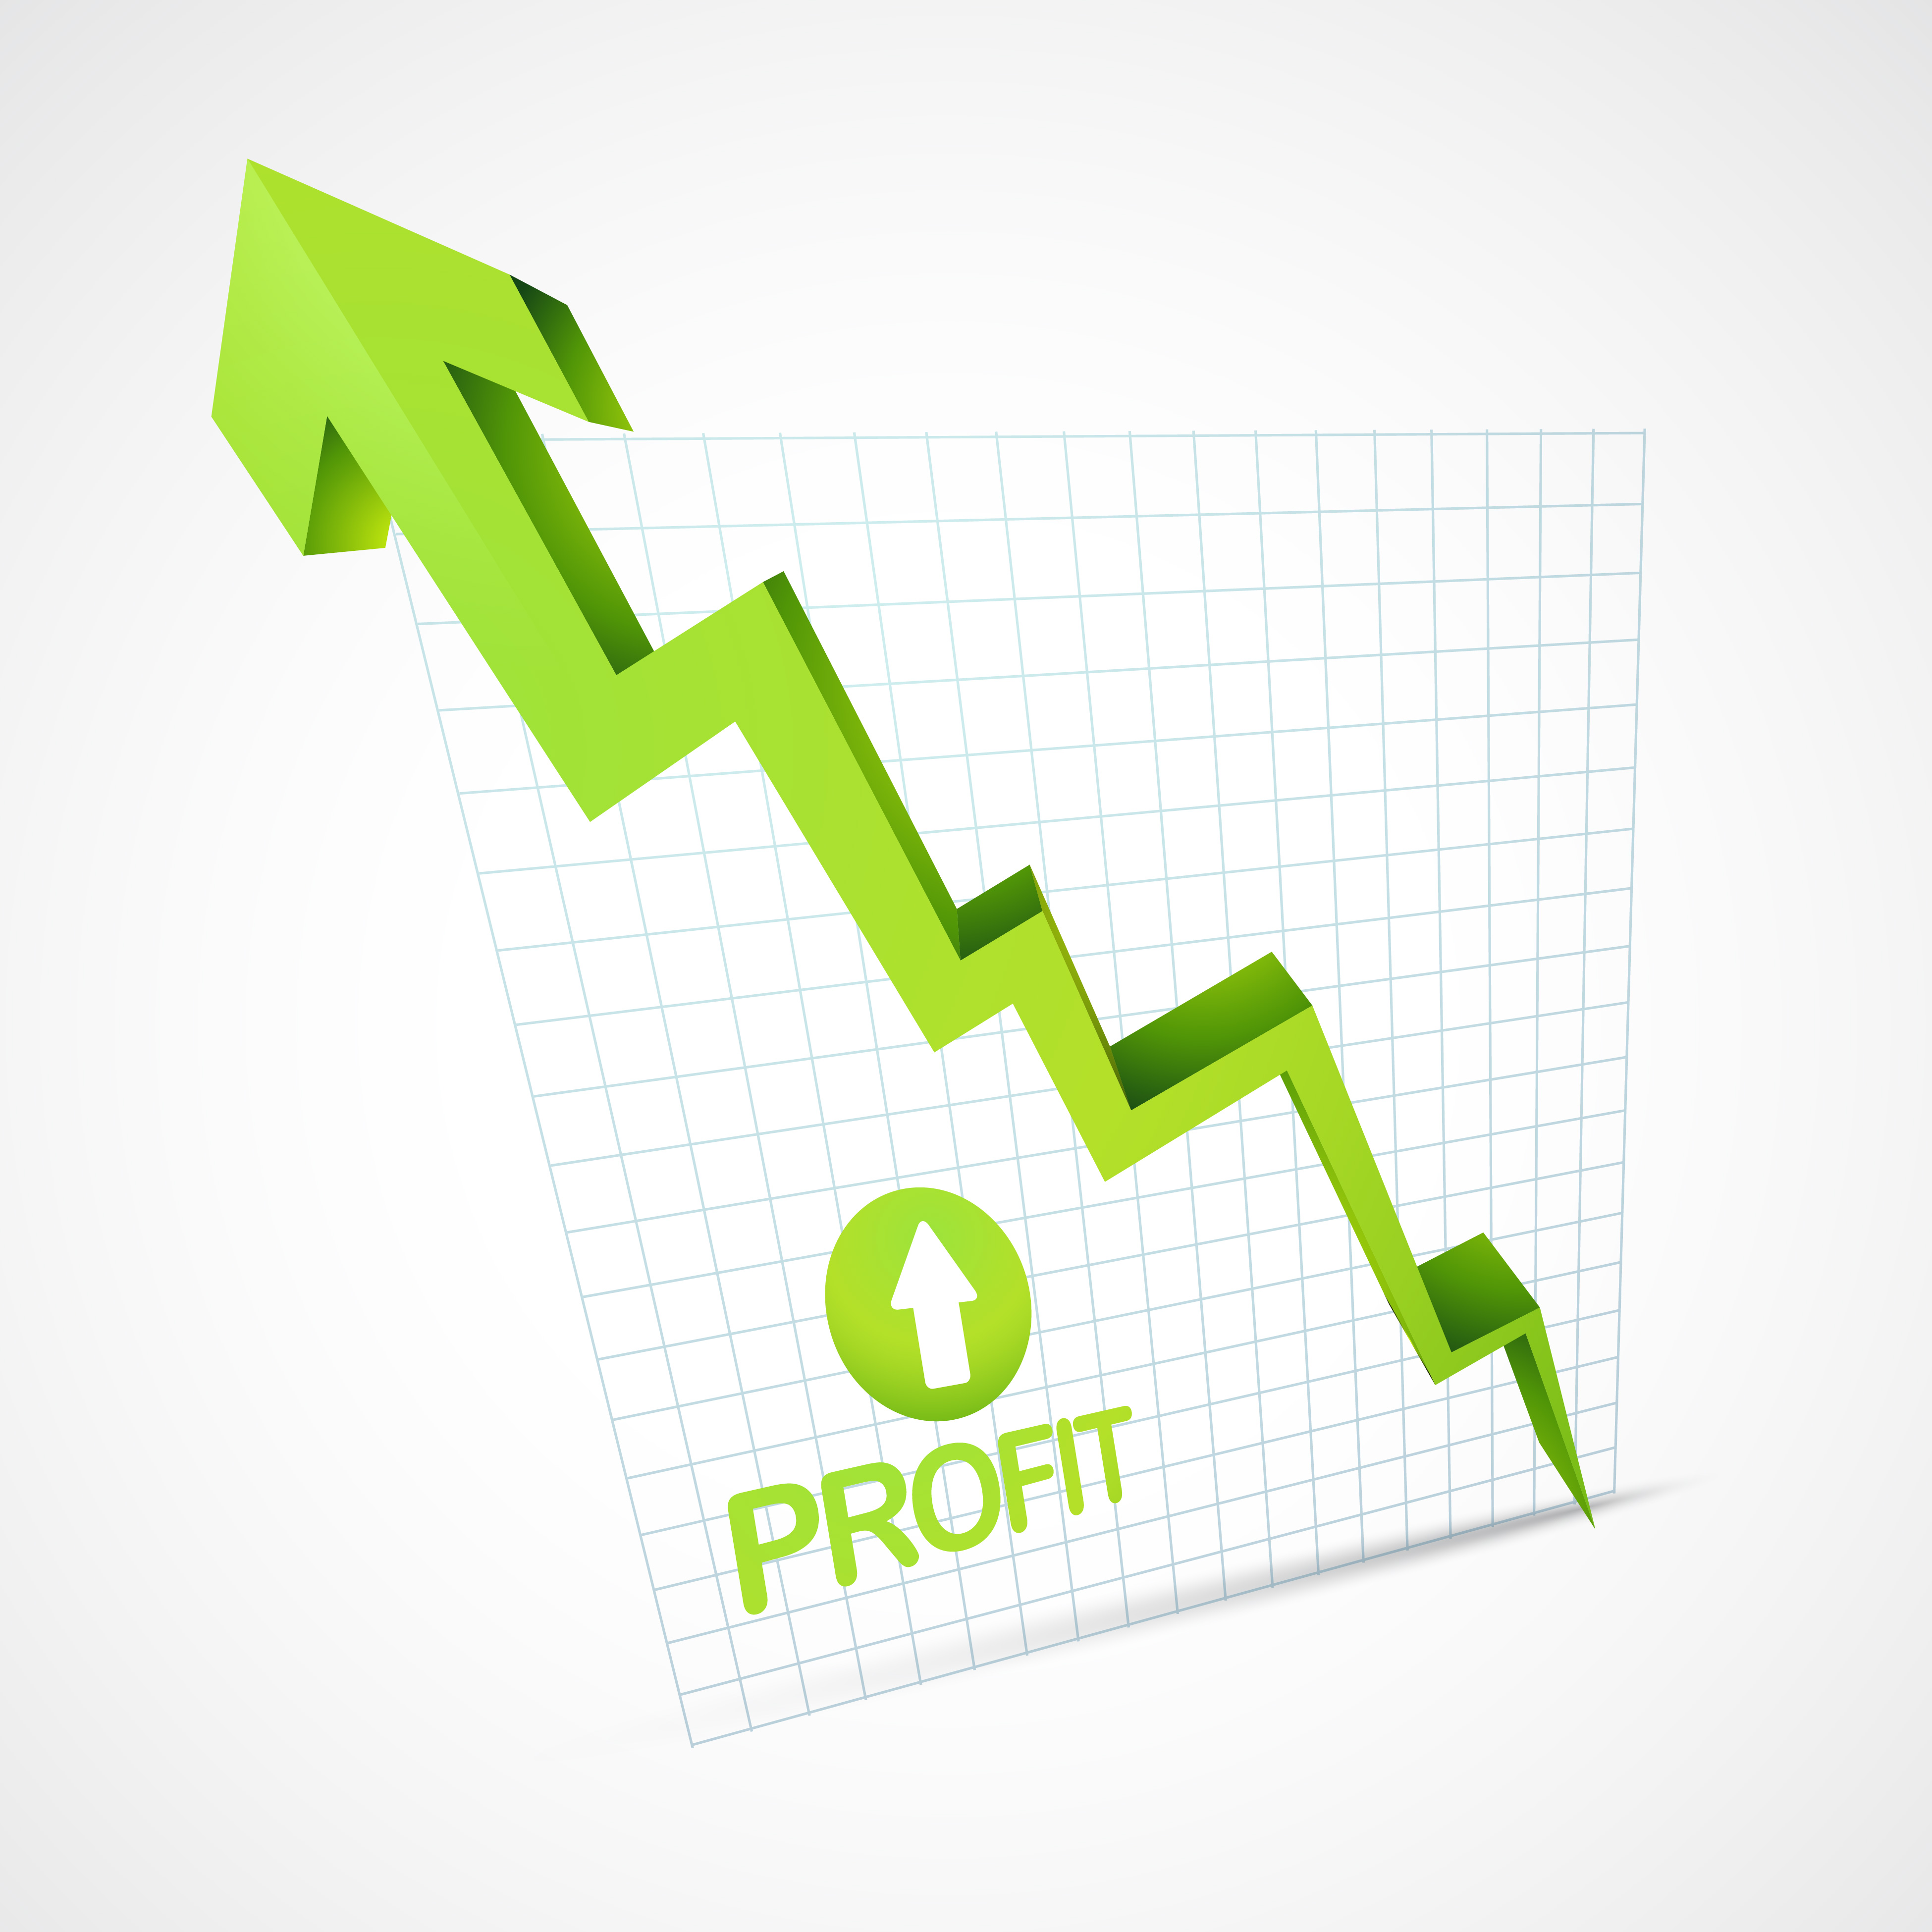 Profit: Download Free Vector Art, Stock